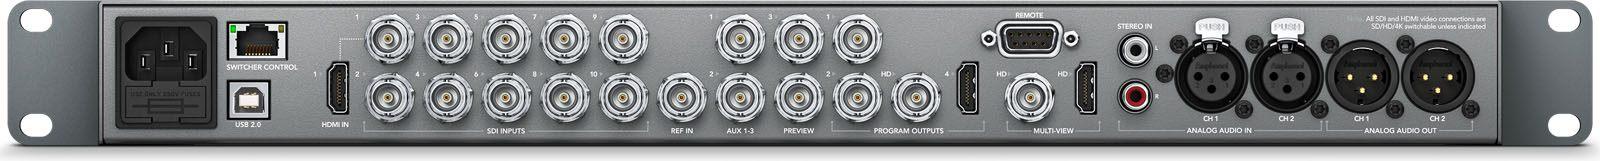 Blackmagic Atem 1 M E Production Studio 4k Swatempsw1me4k Atem Switcher